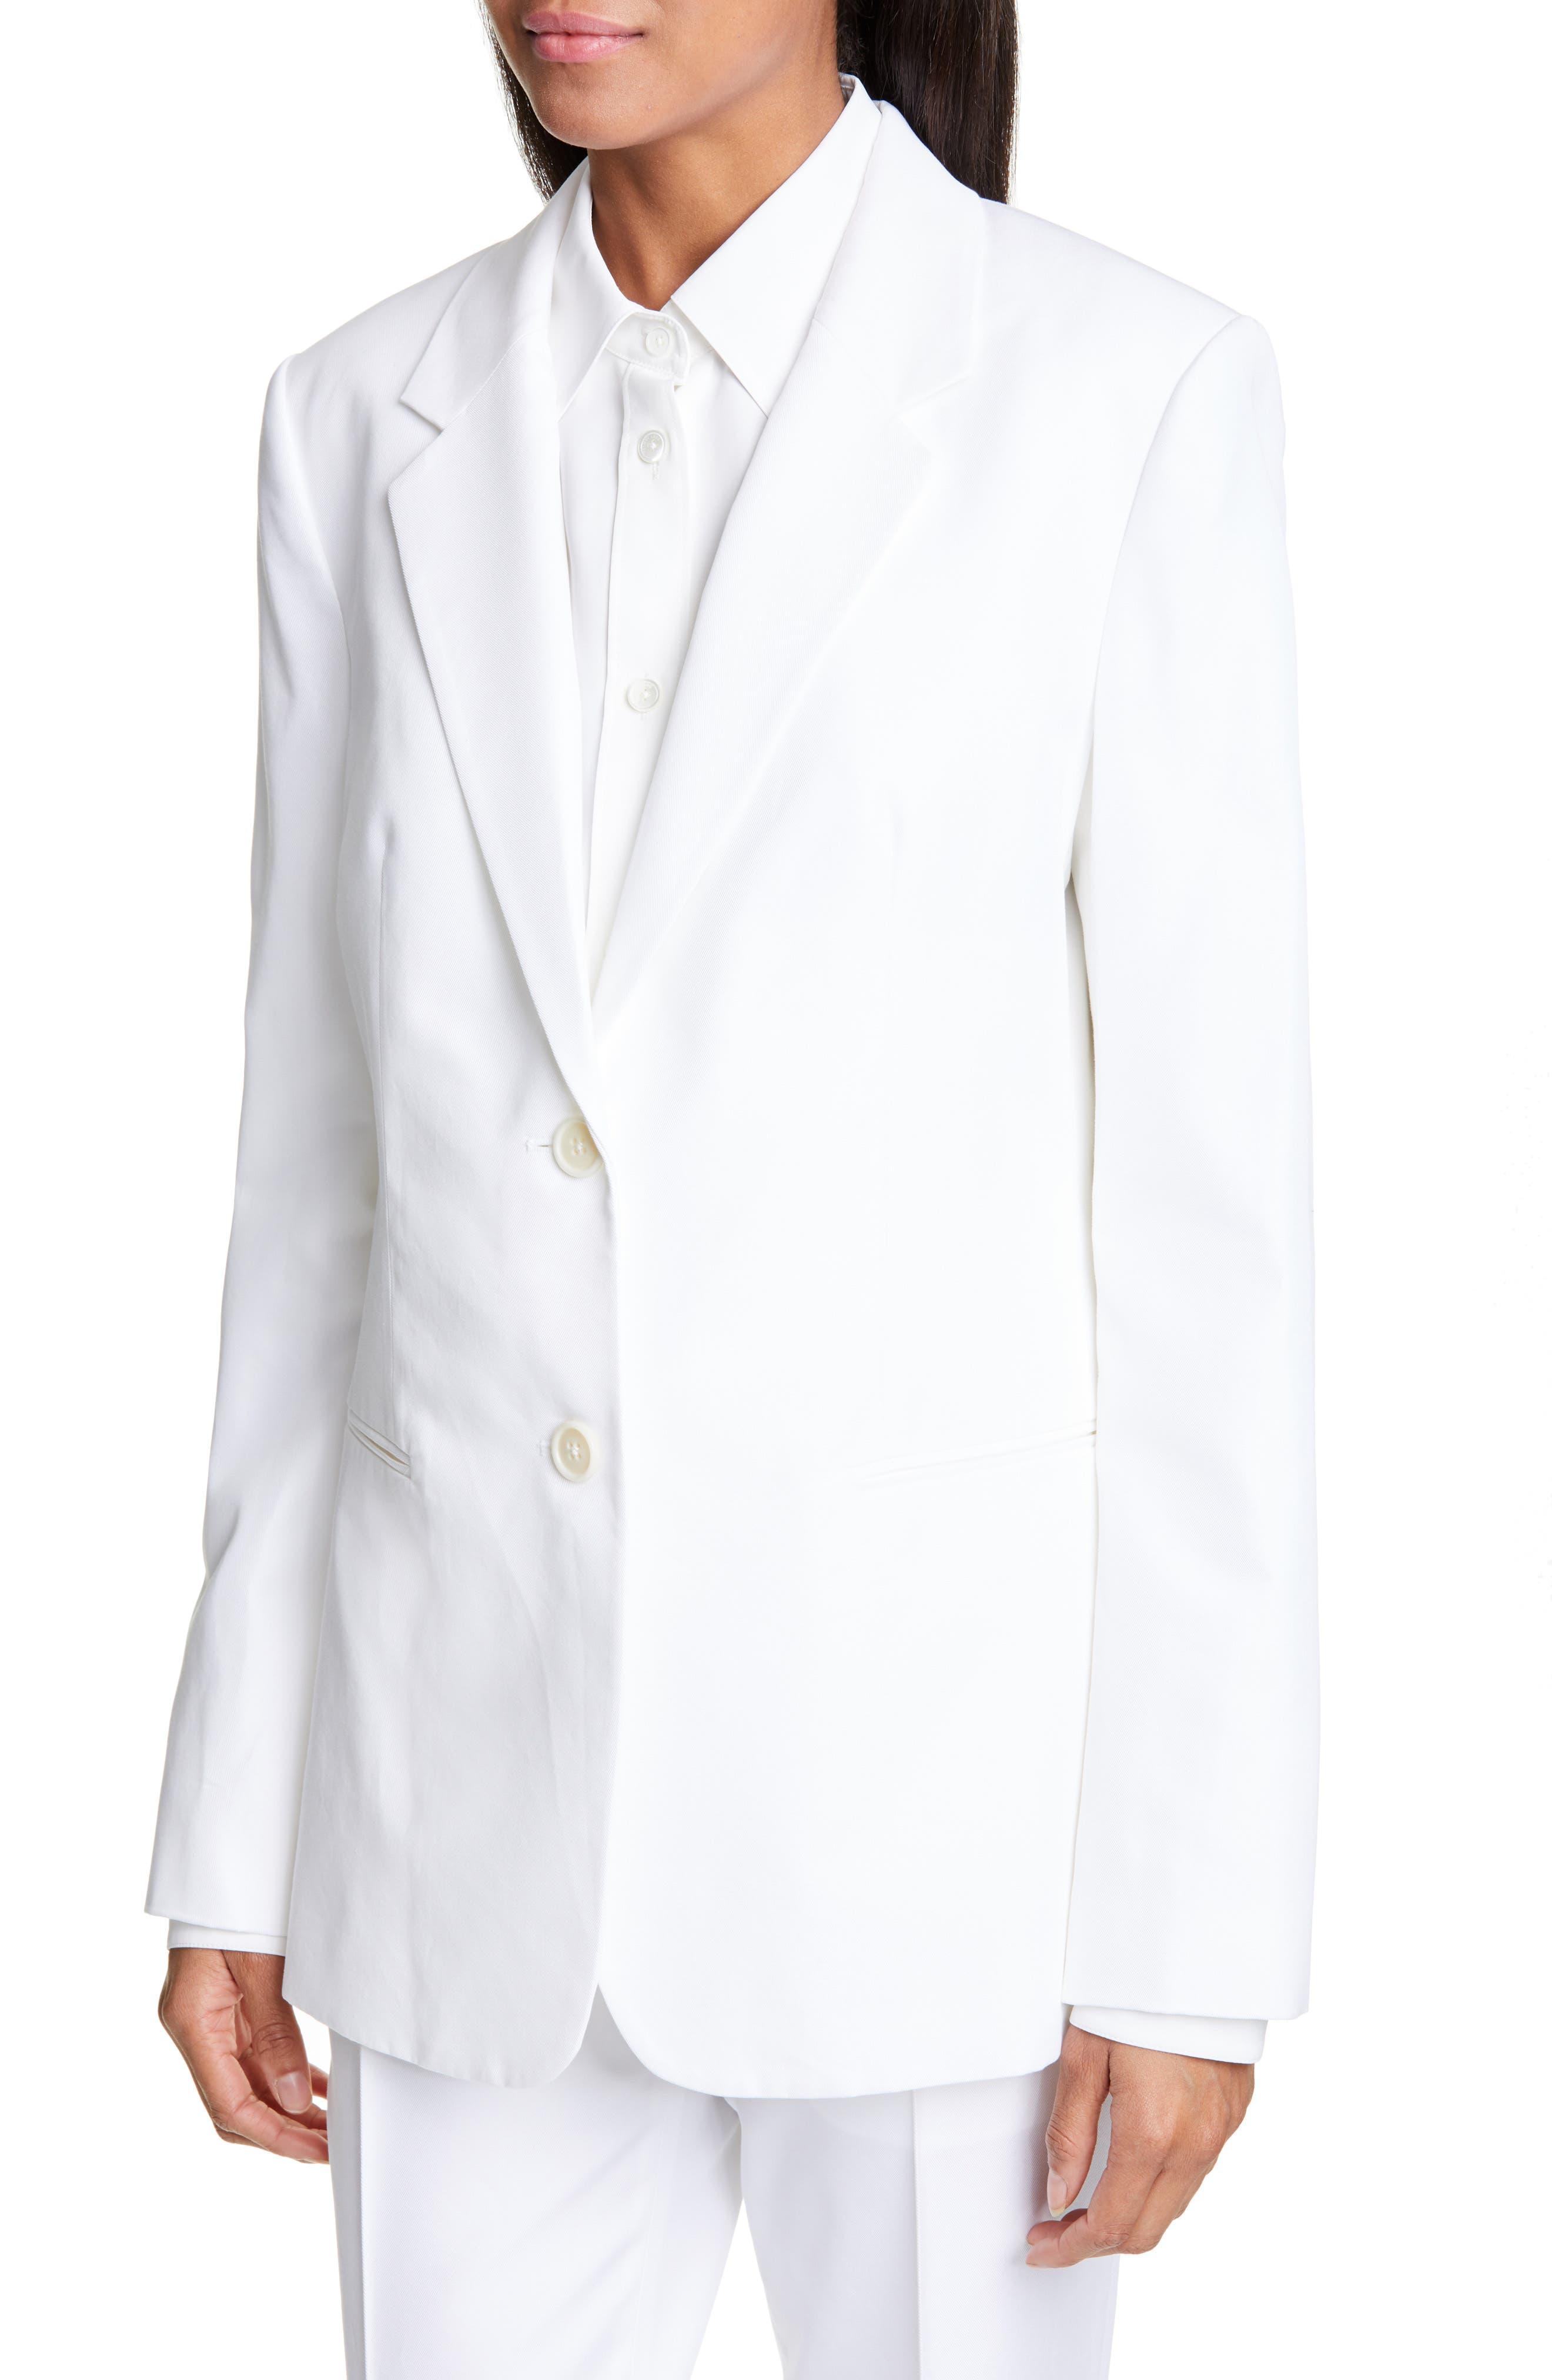 HELMUT LANG, Cotton Blend Blazer, Alternate thumbnail 5, color, WHITE